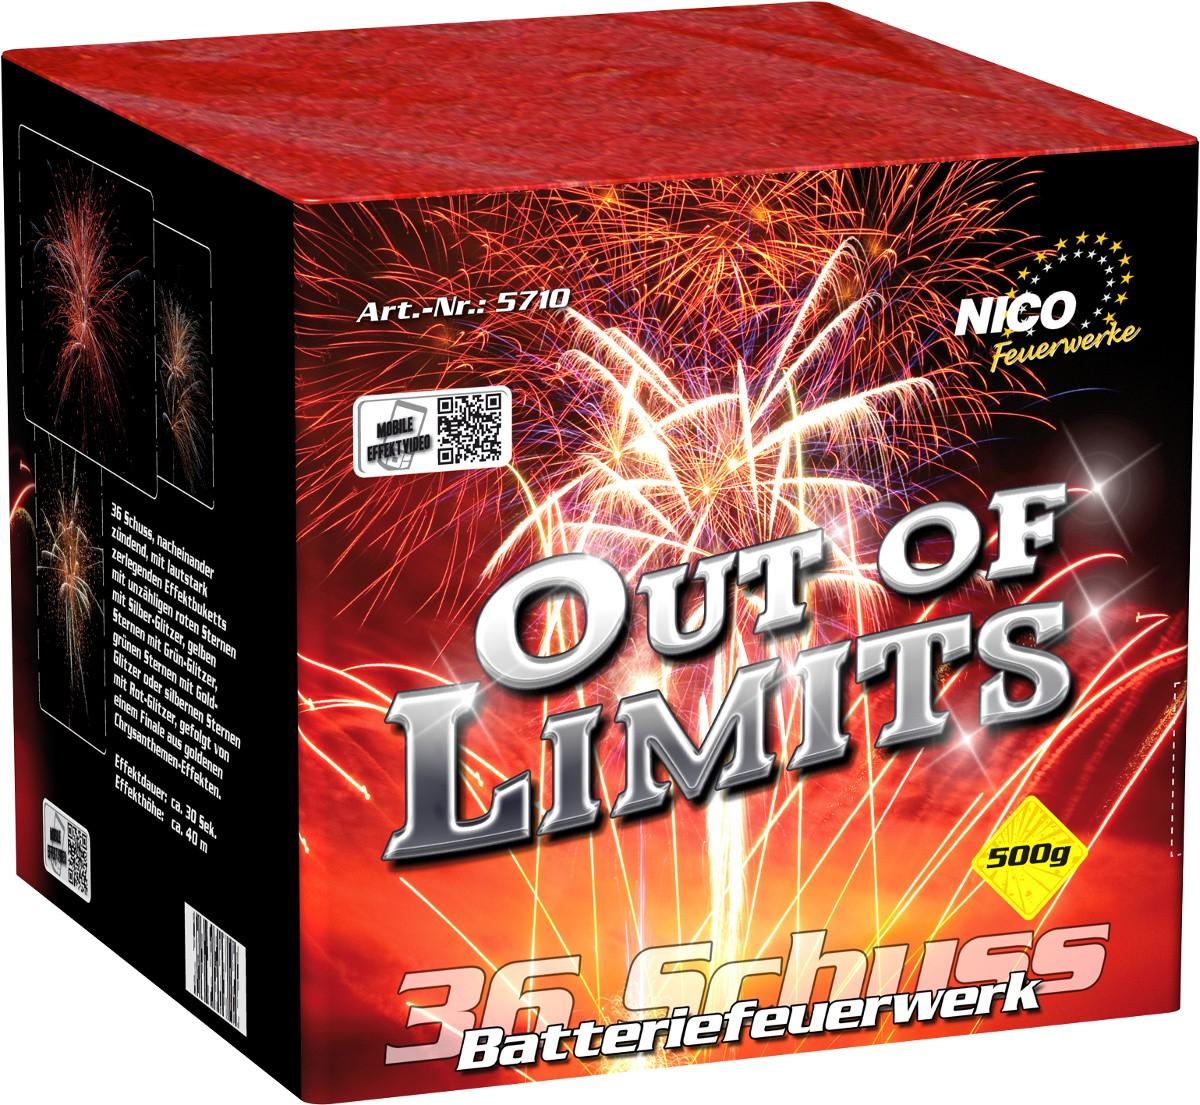 Batterie Feuerwerk Out of Limits 36 Schuss